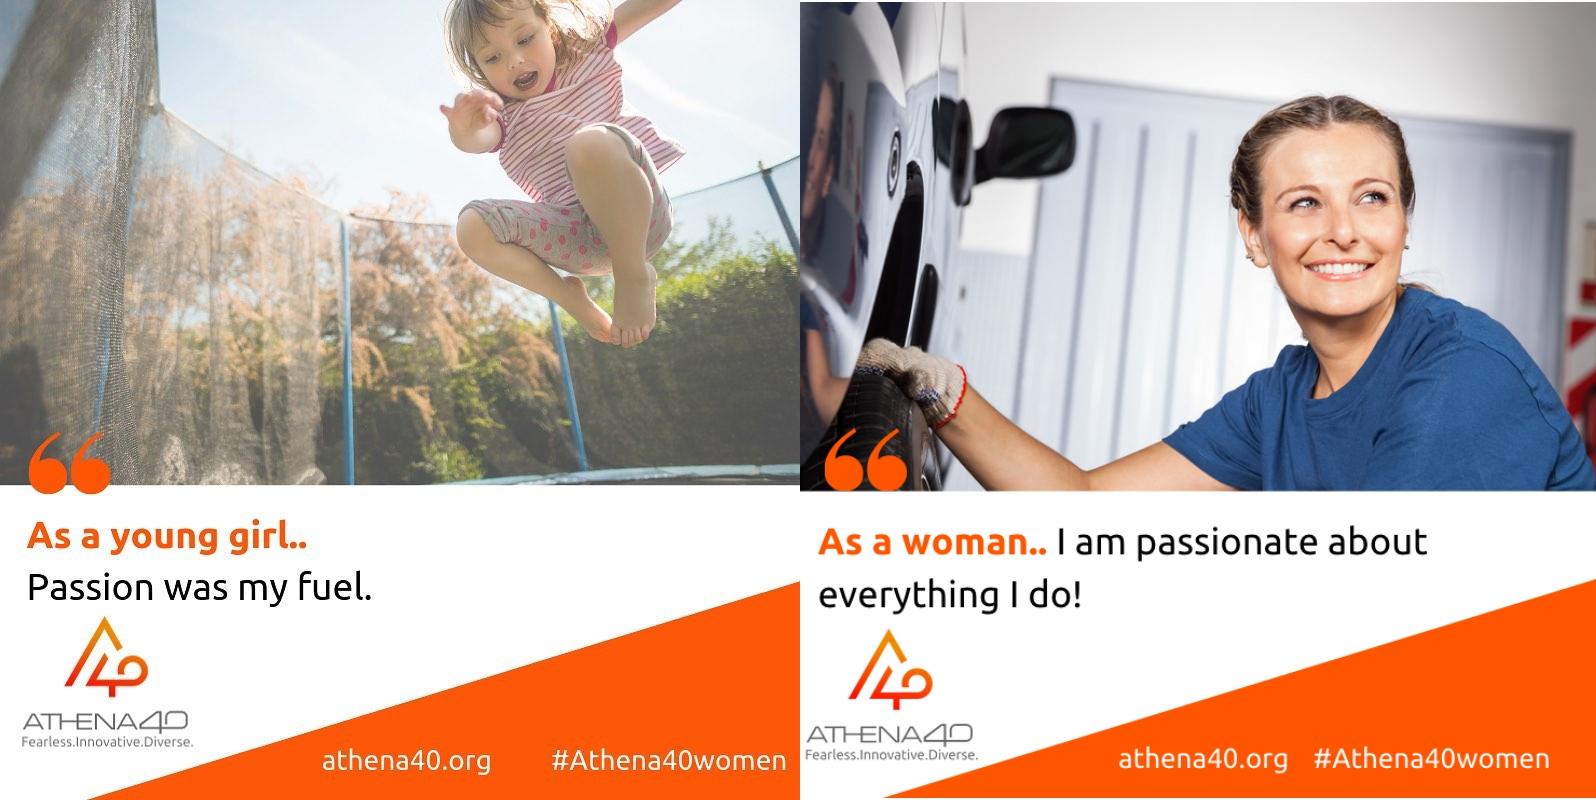 Athena40 Passion as a Girl as a Woman.jpg